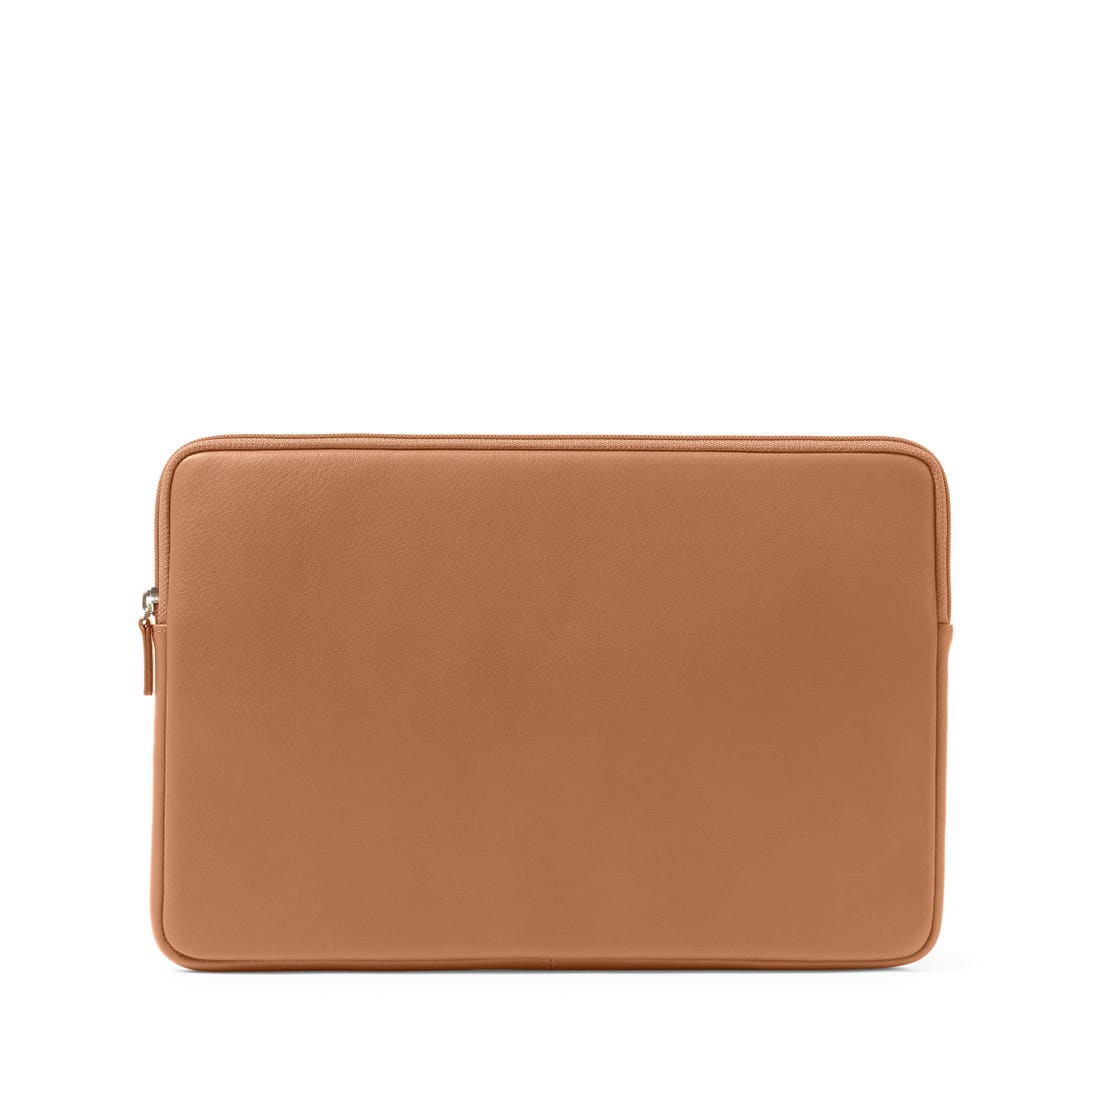 13 Inch MacBook Pro Sleeve